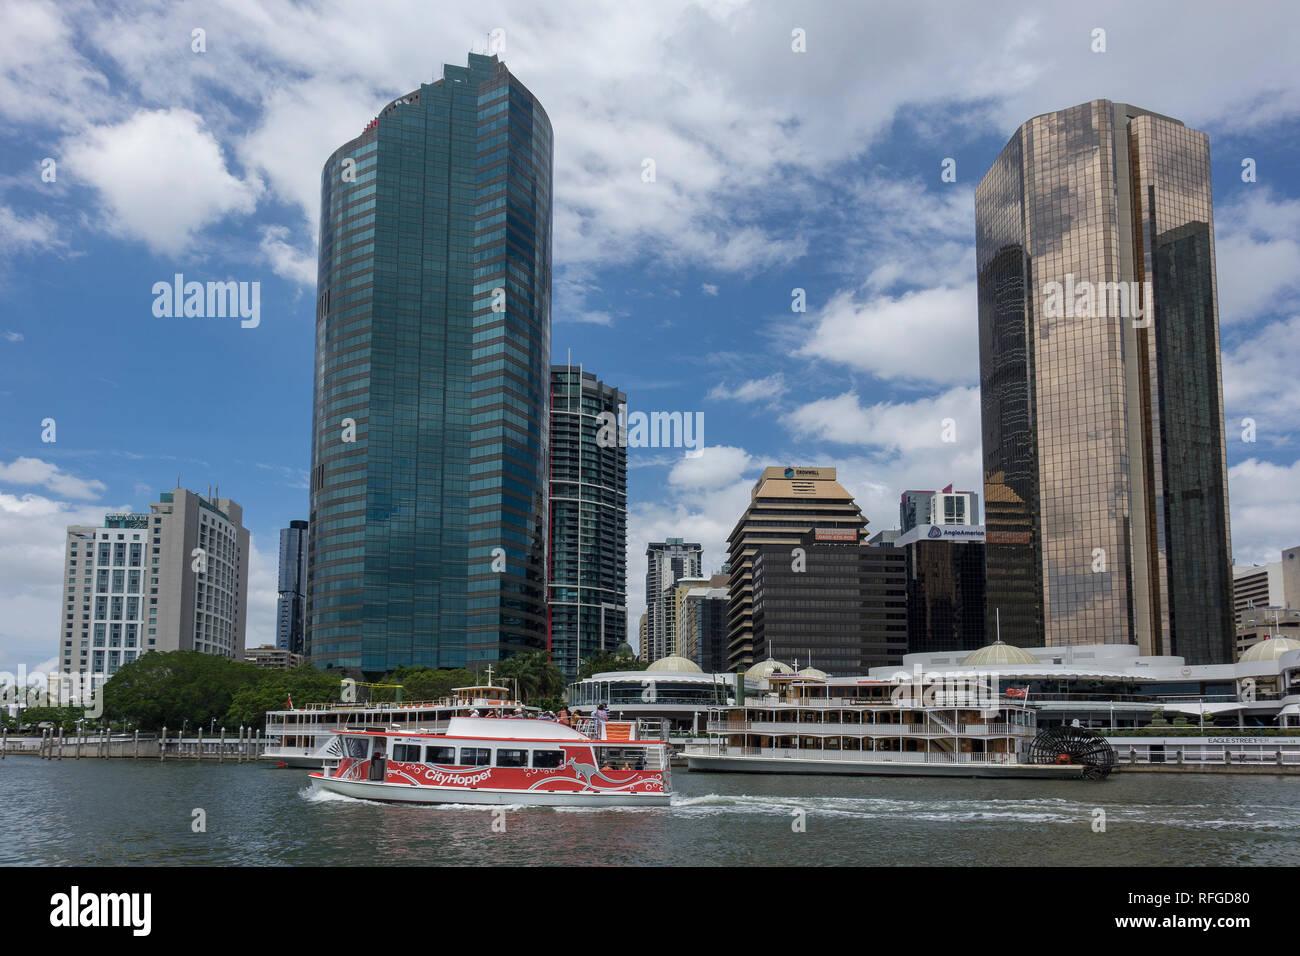 Australia, Queensland, Brisbane, skyline at Eagle street pier - Stock Image